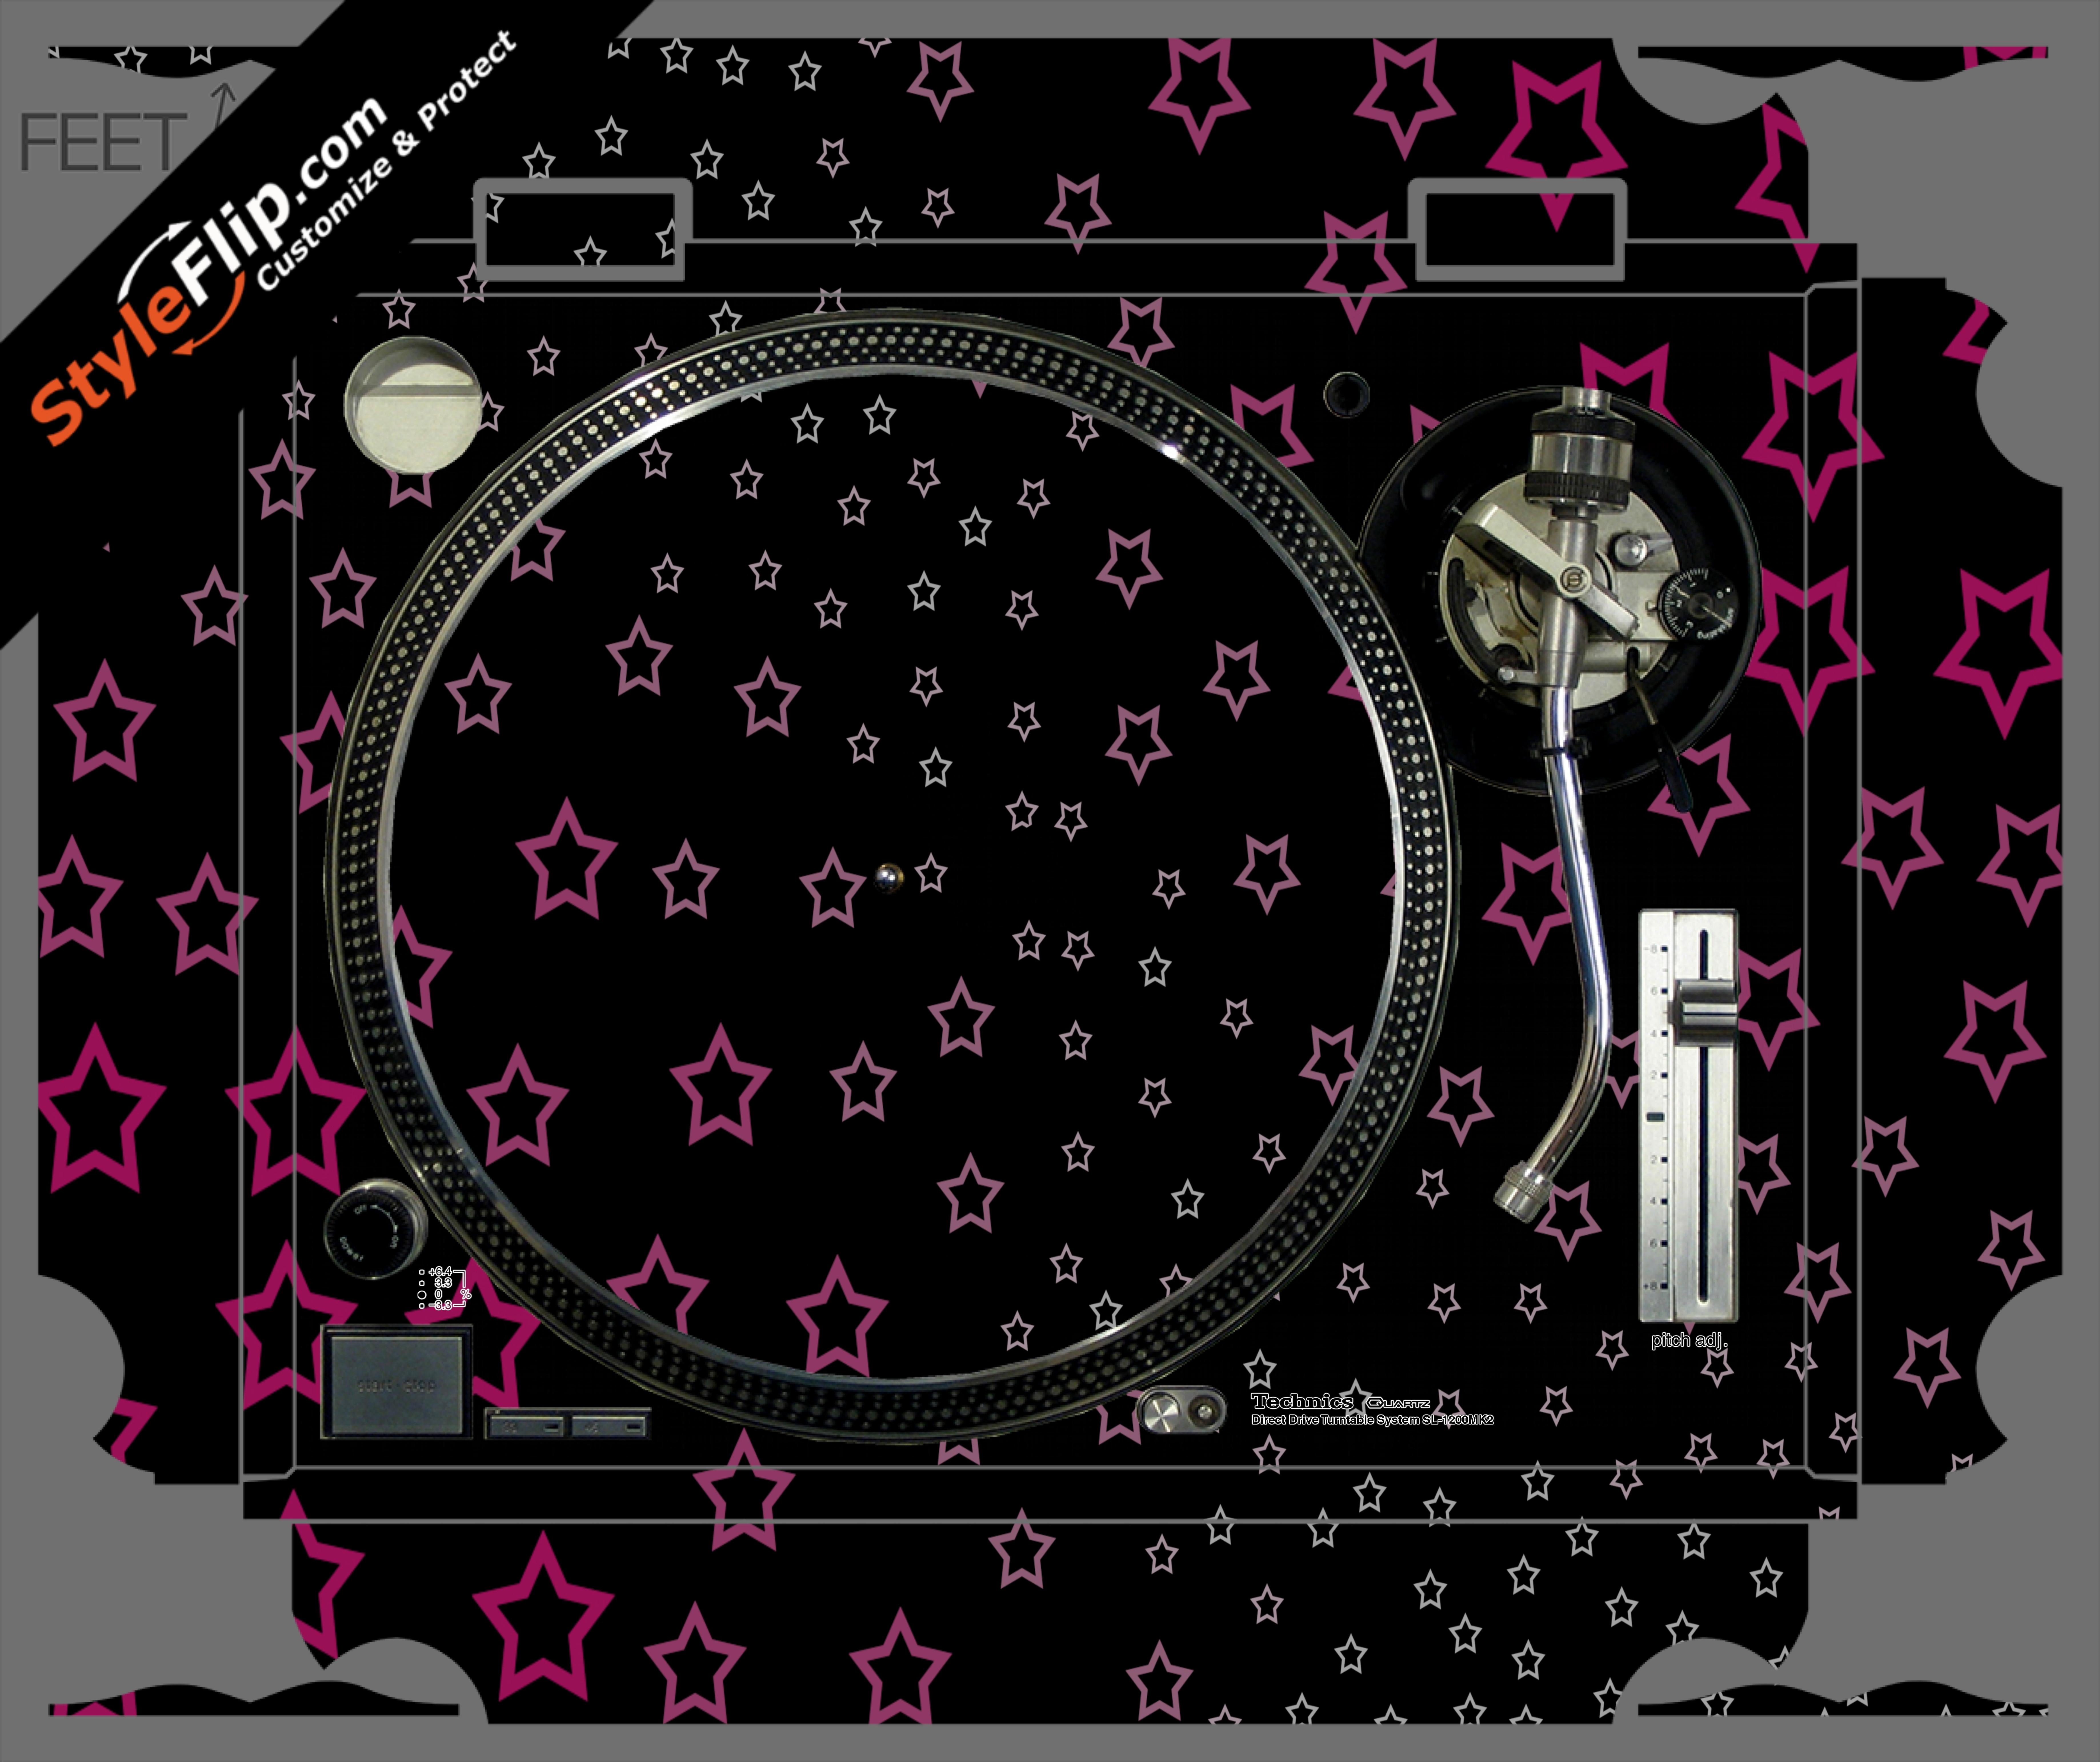 Starry Technics SL-1200 MK2